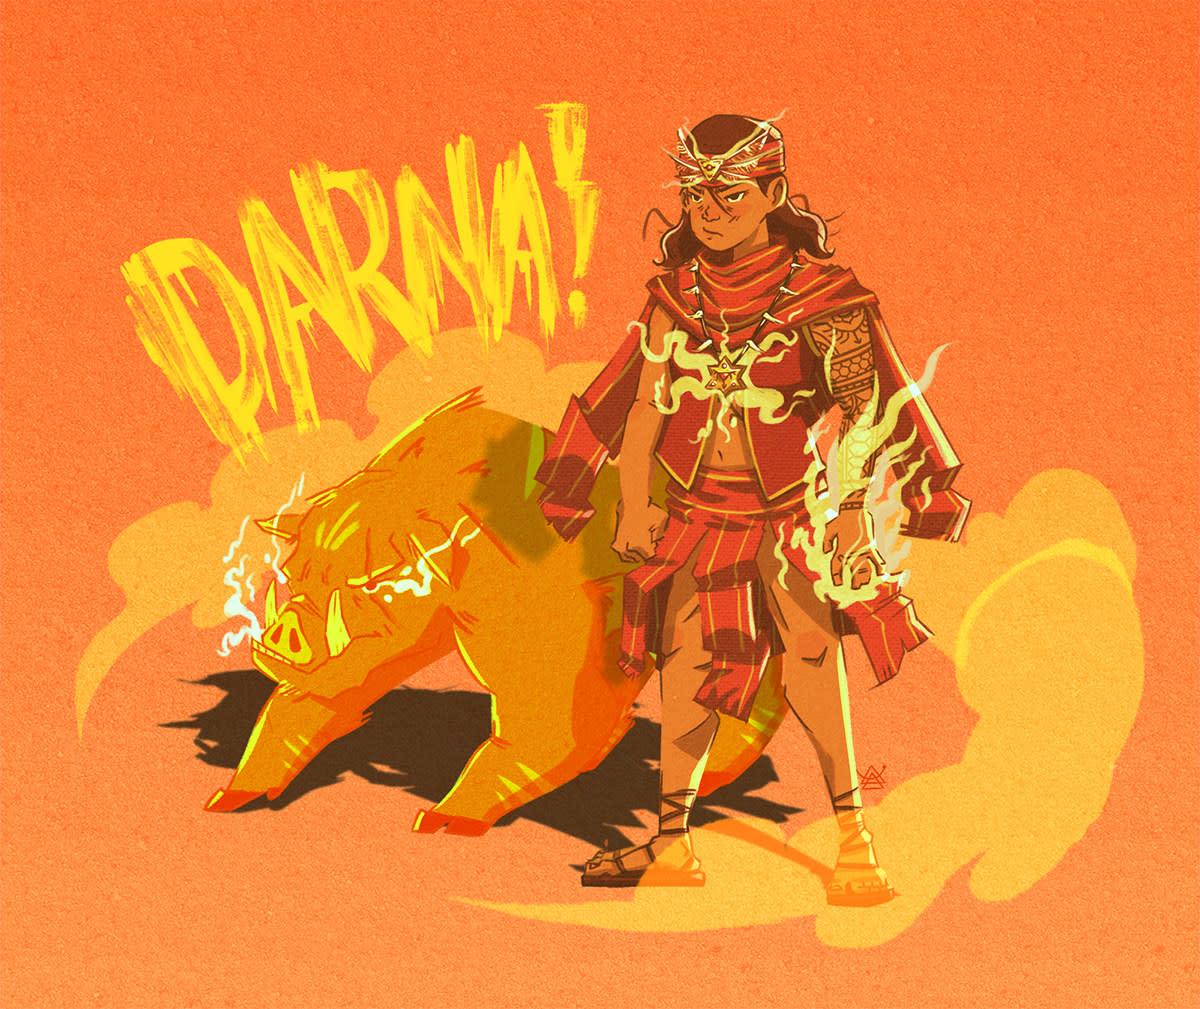 Filipino comics superheroine Darna, reimagined as a babaylan by Marx Reinhart Fidel